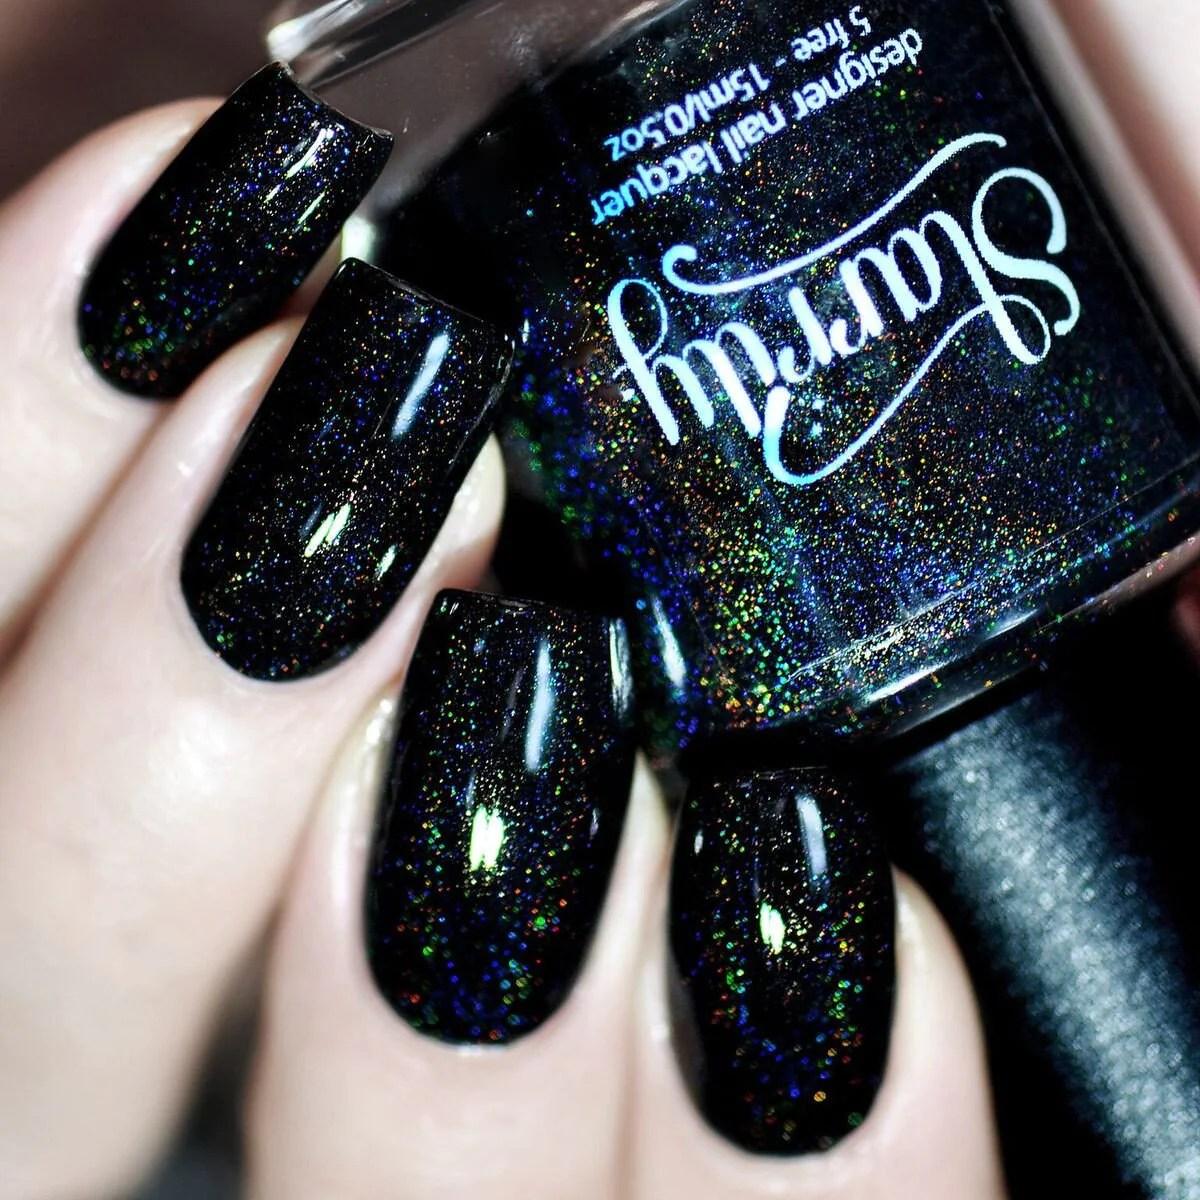 starrily black magic - holographic